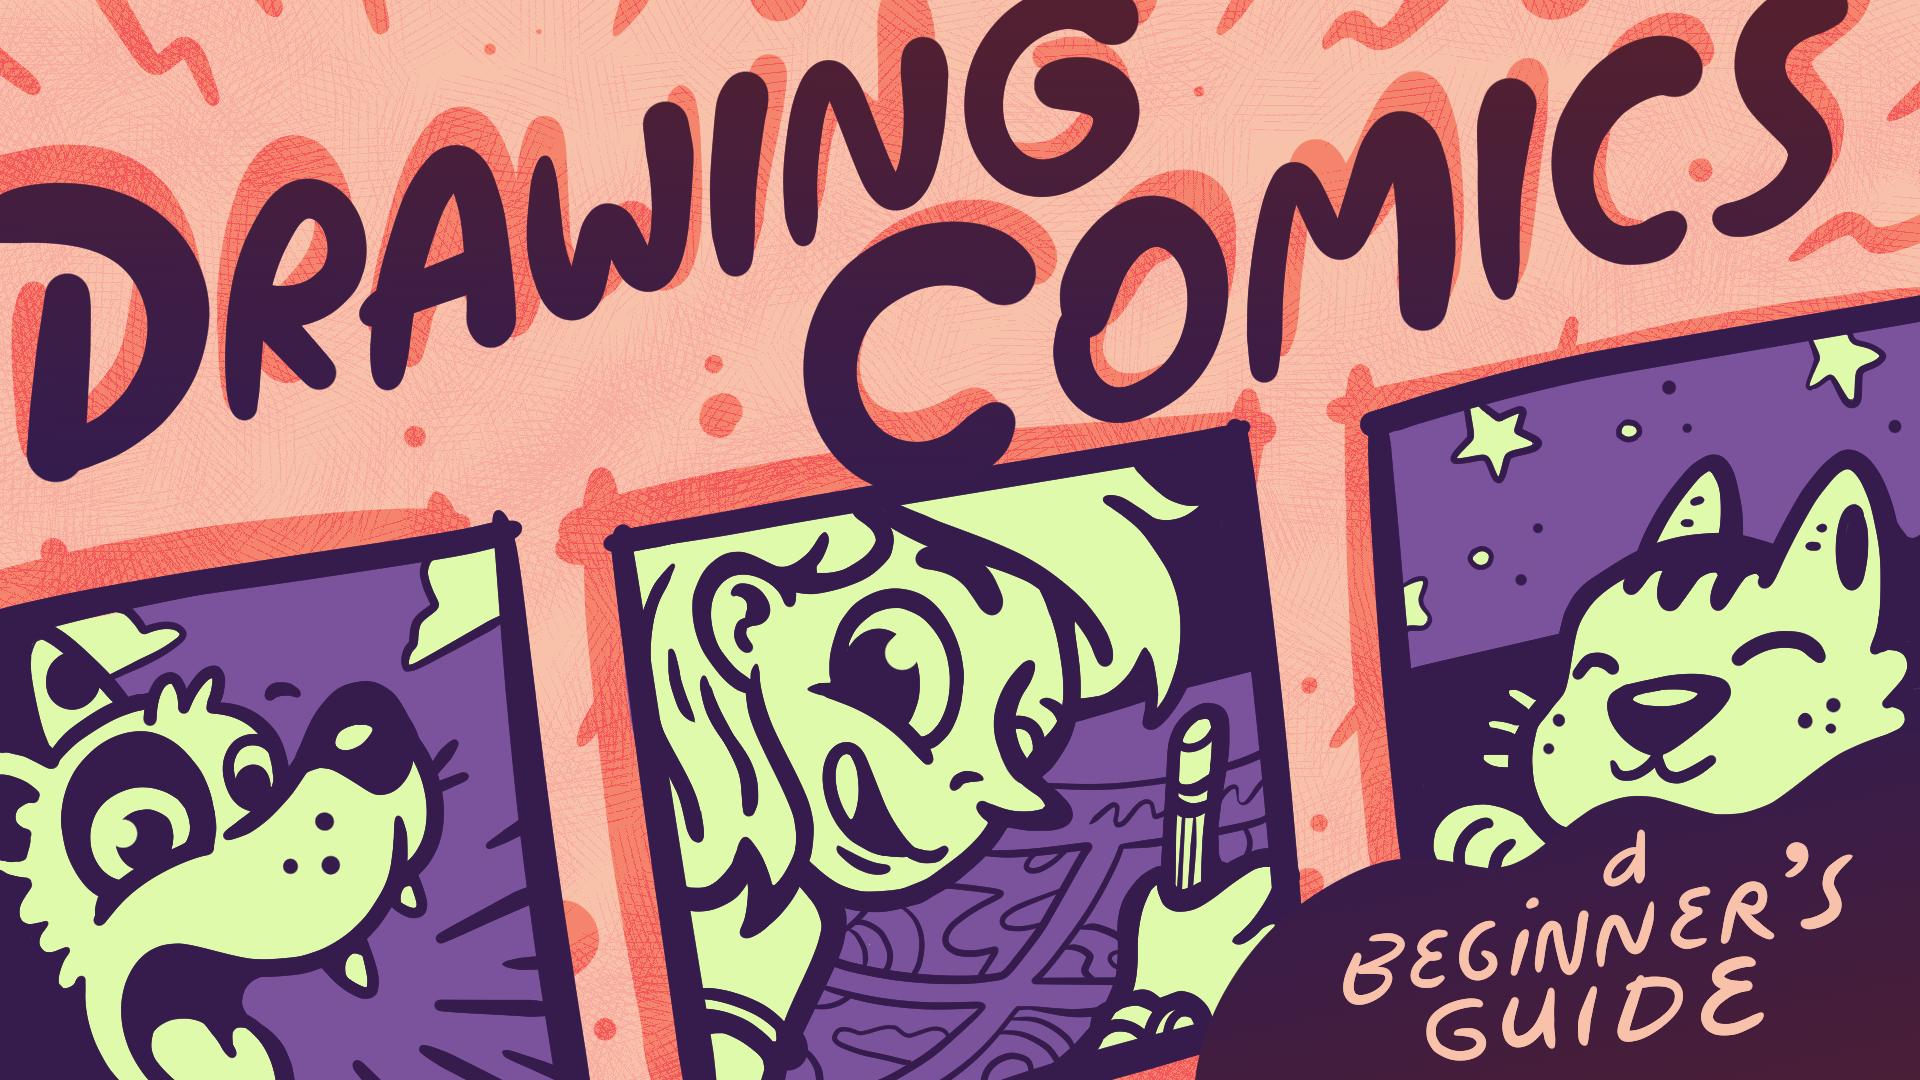 Drawing Comics - title card.png